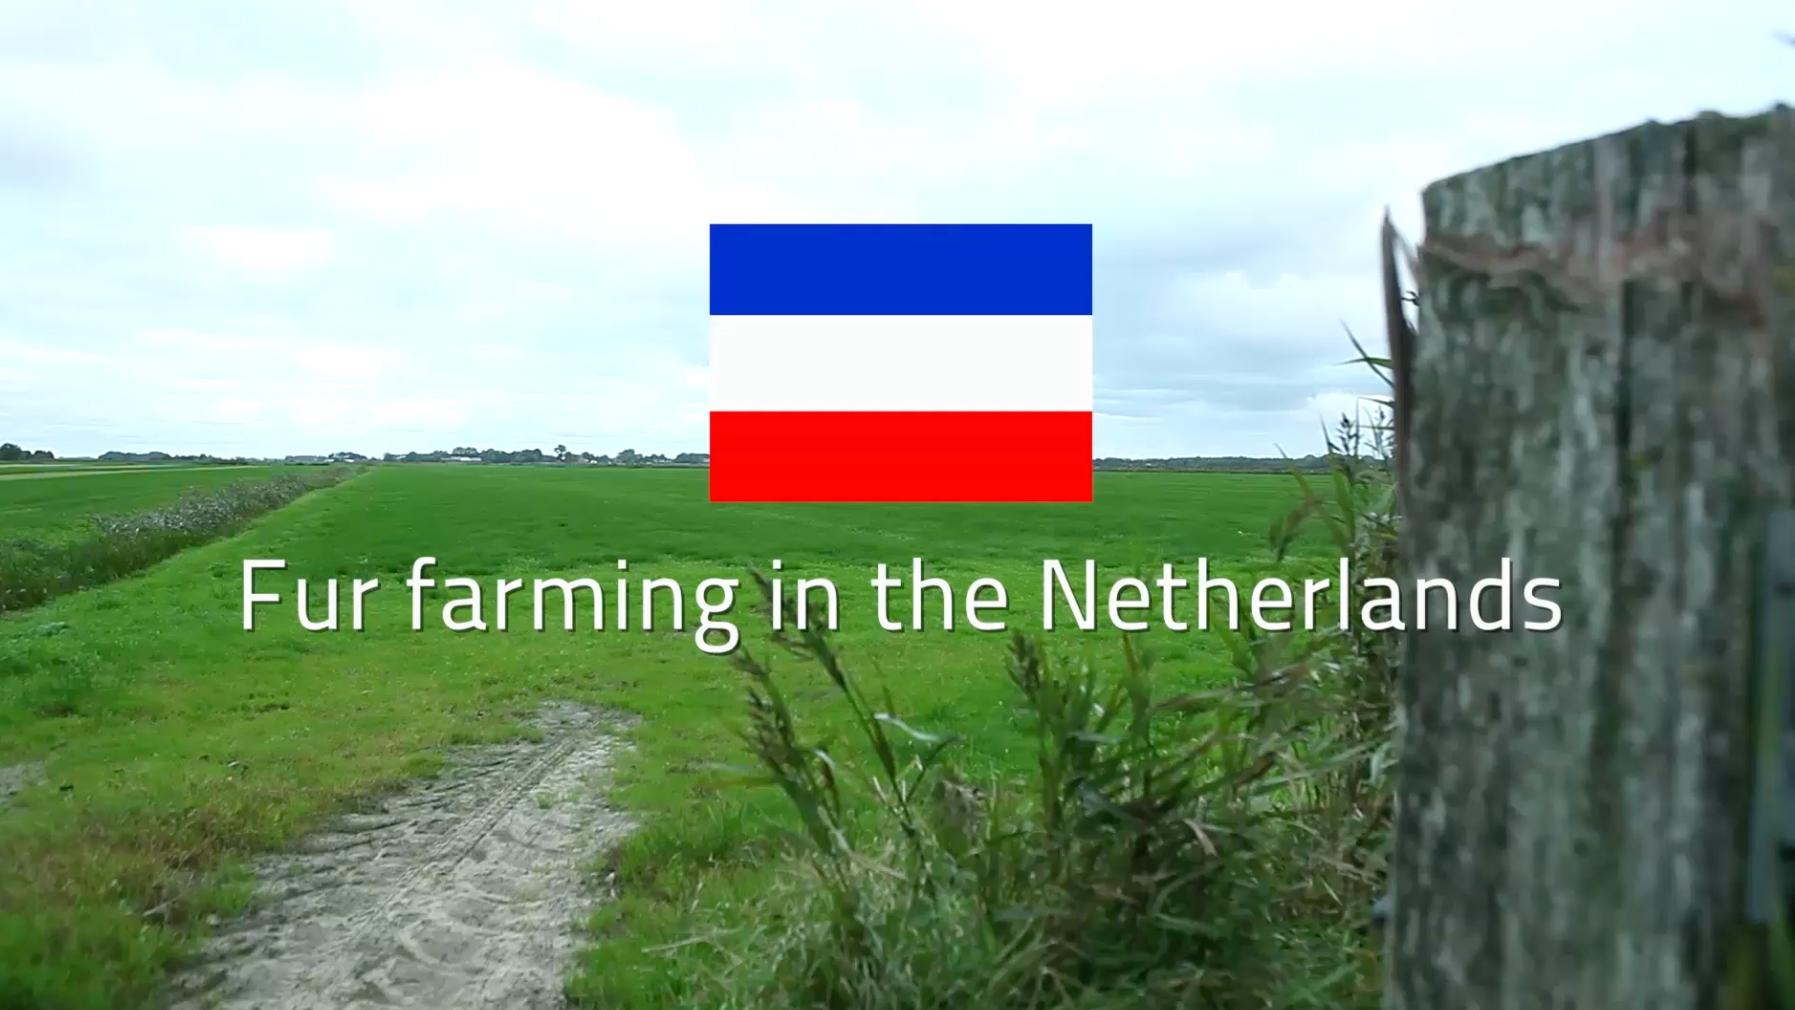 Pauline Blanken, Fur Farming in the Netherlands